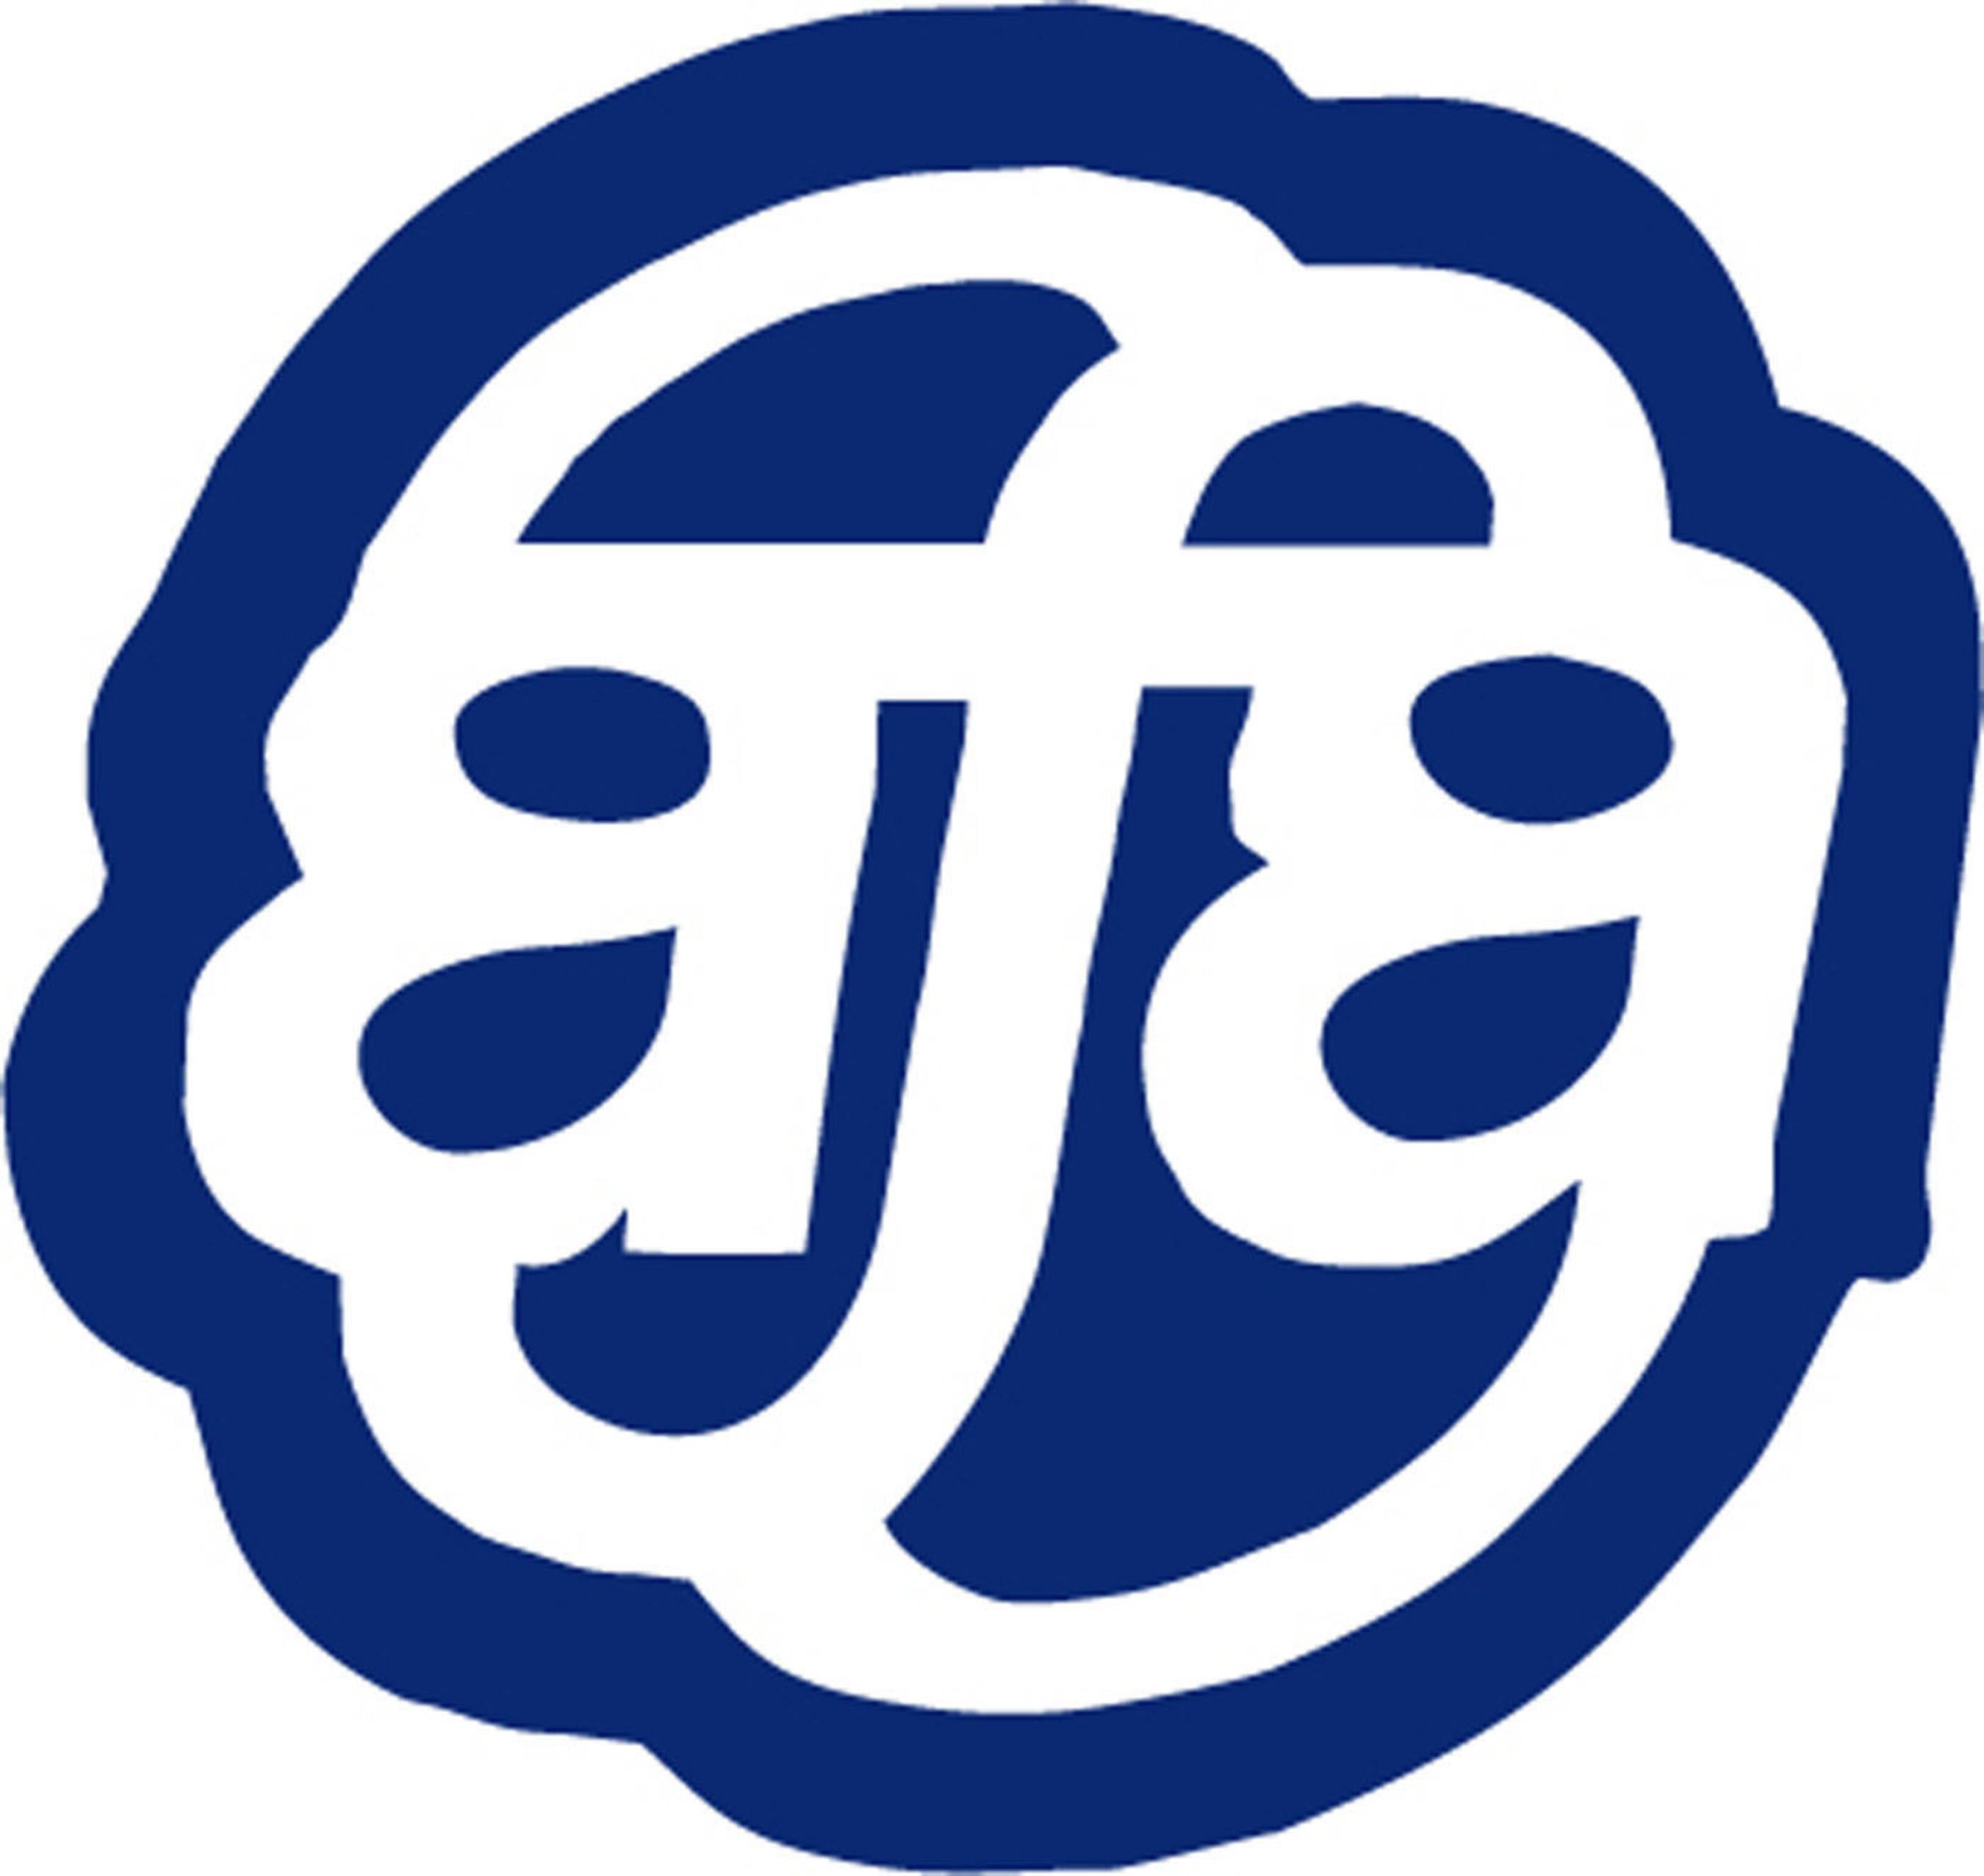 Association of Flight Attendants-CWA (AFA)